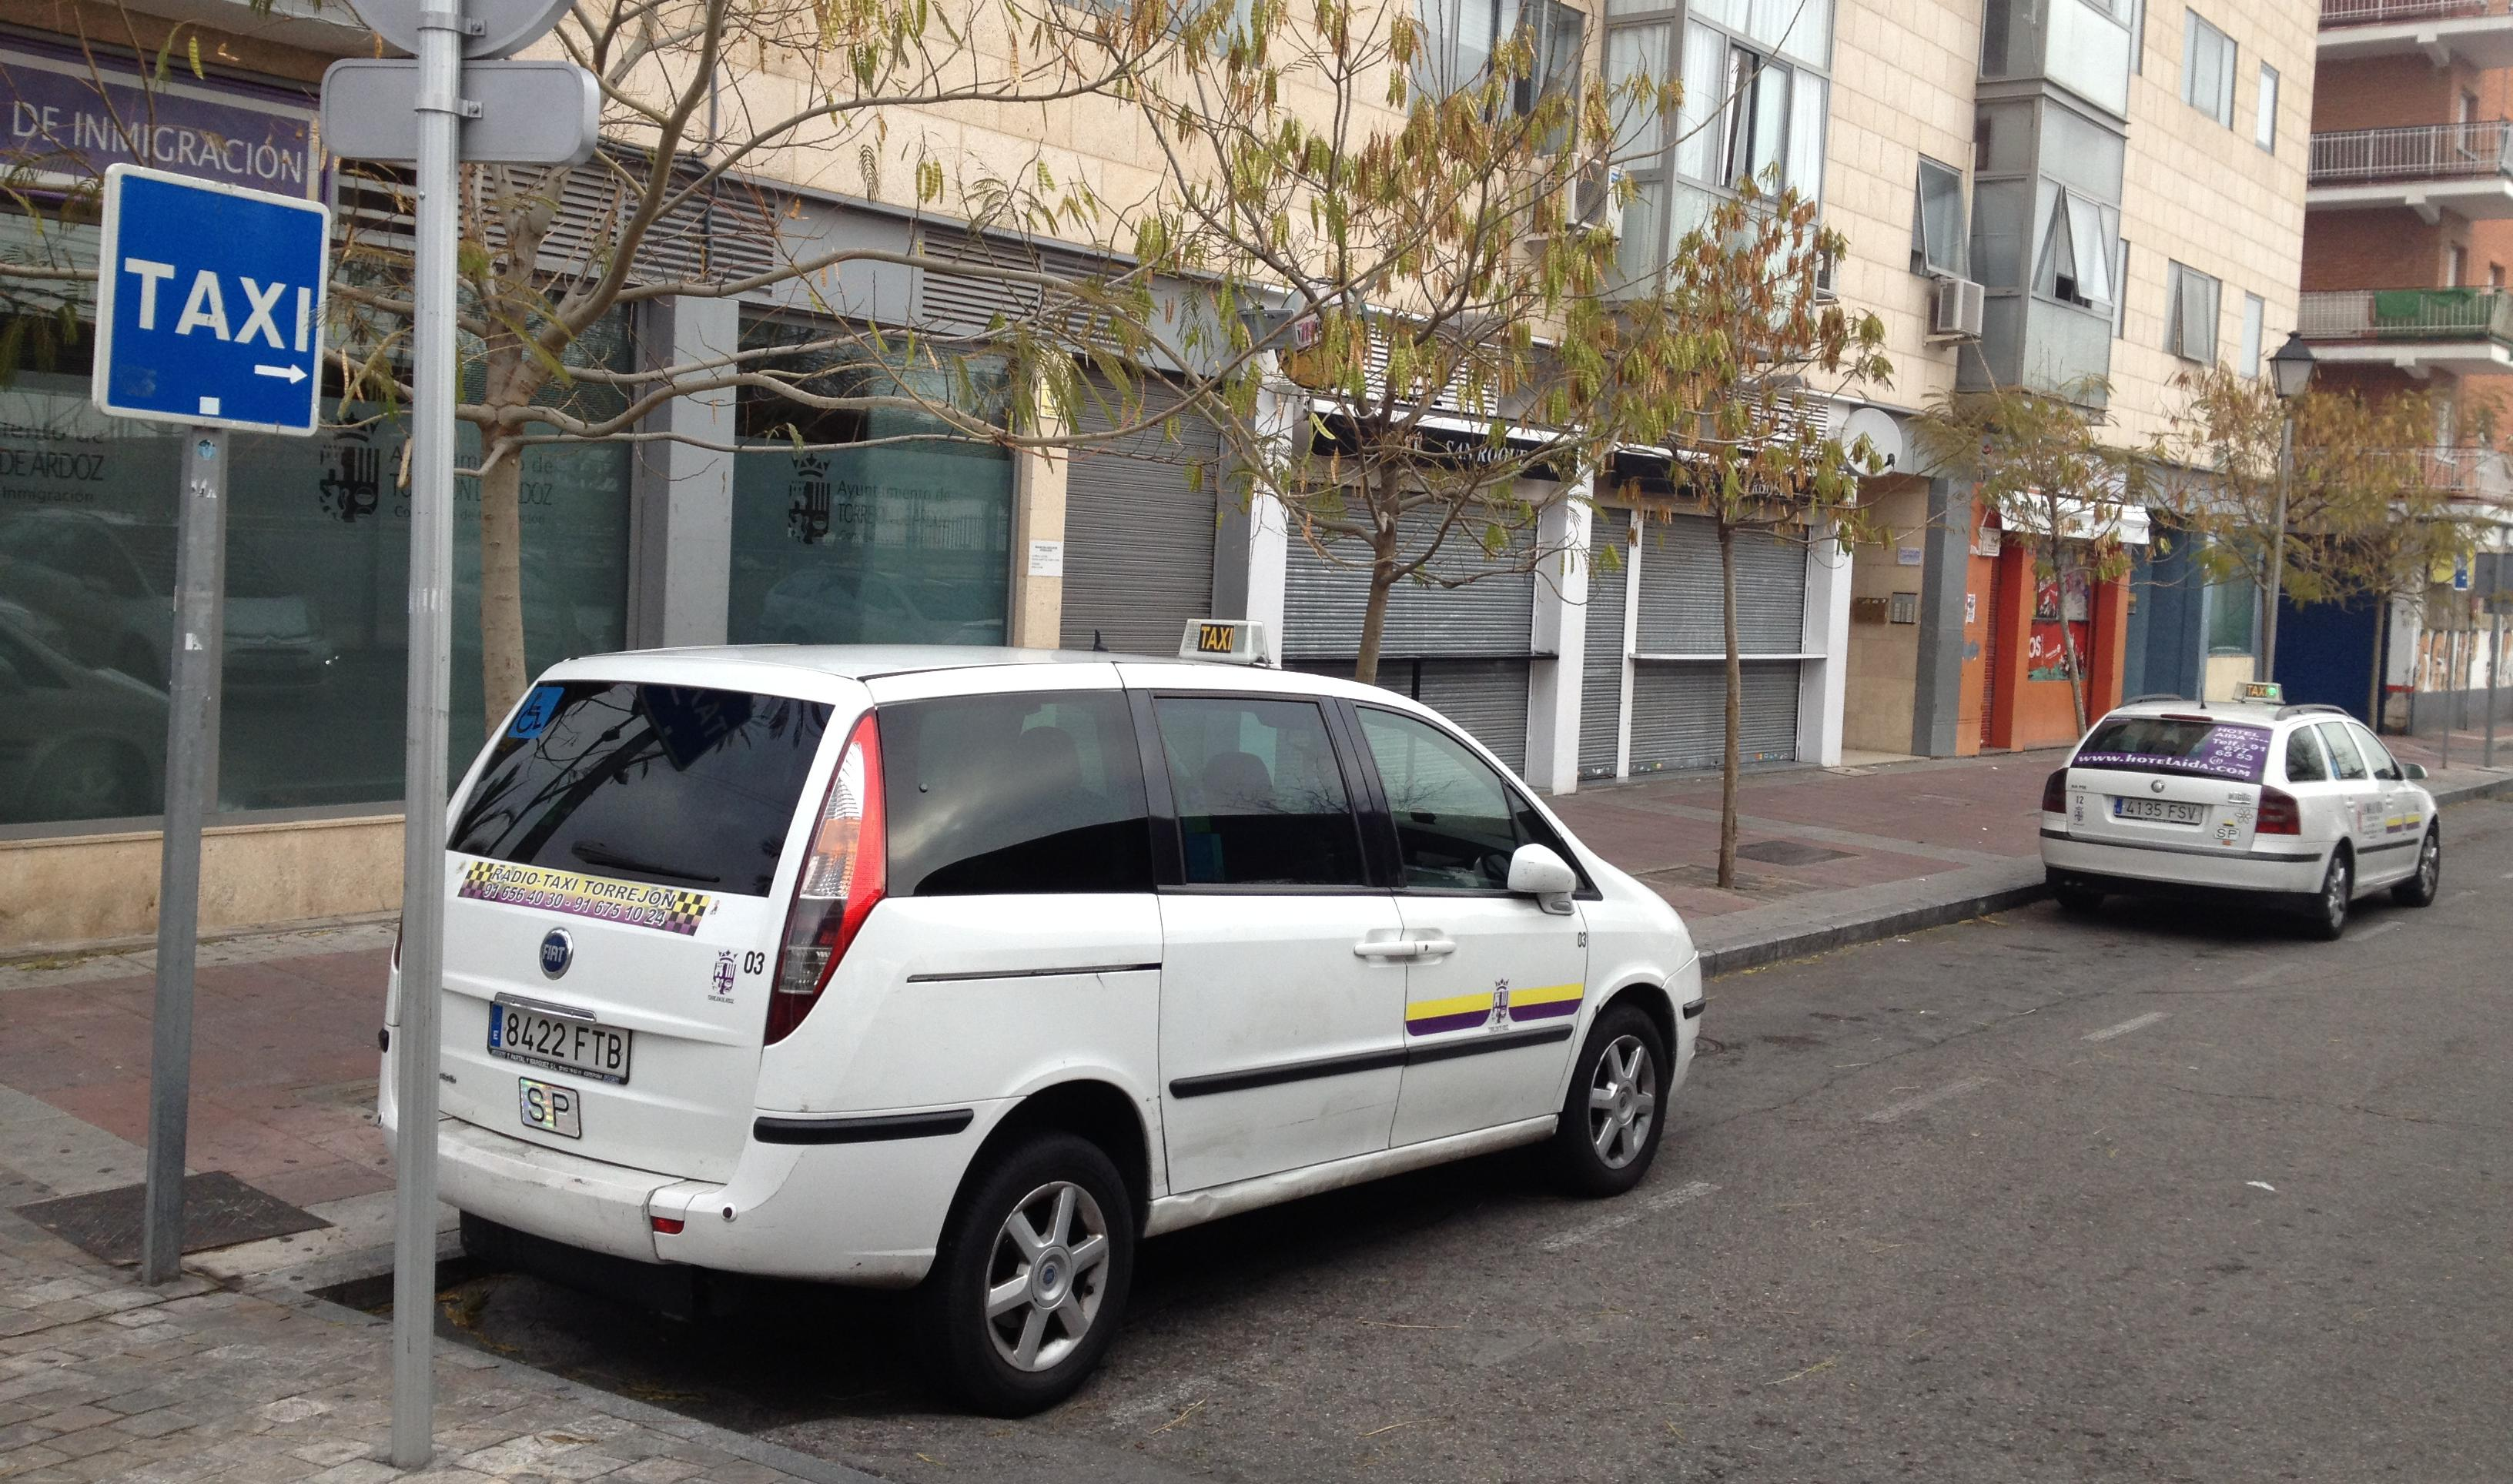 Foto 5 de Taxis en Torrejón de Ardoz | Radio Taxi Torrejón